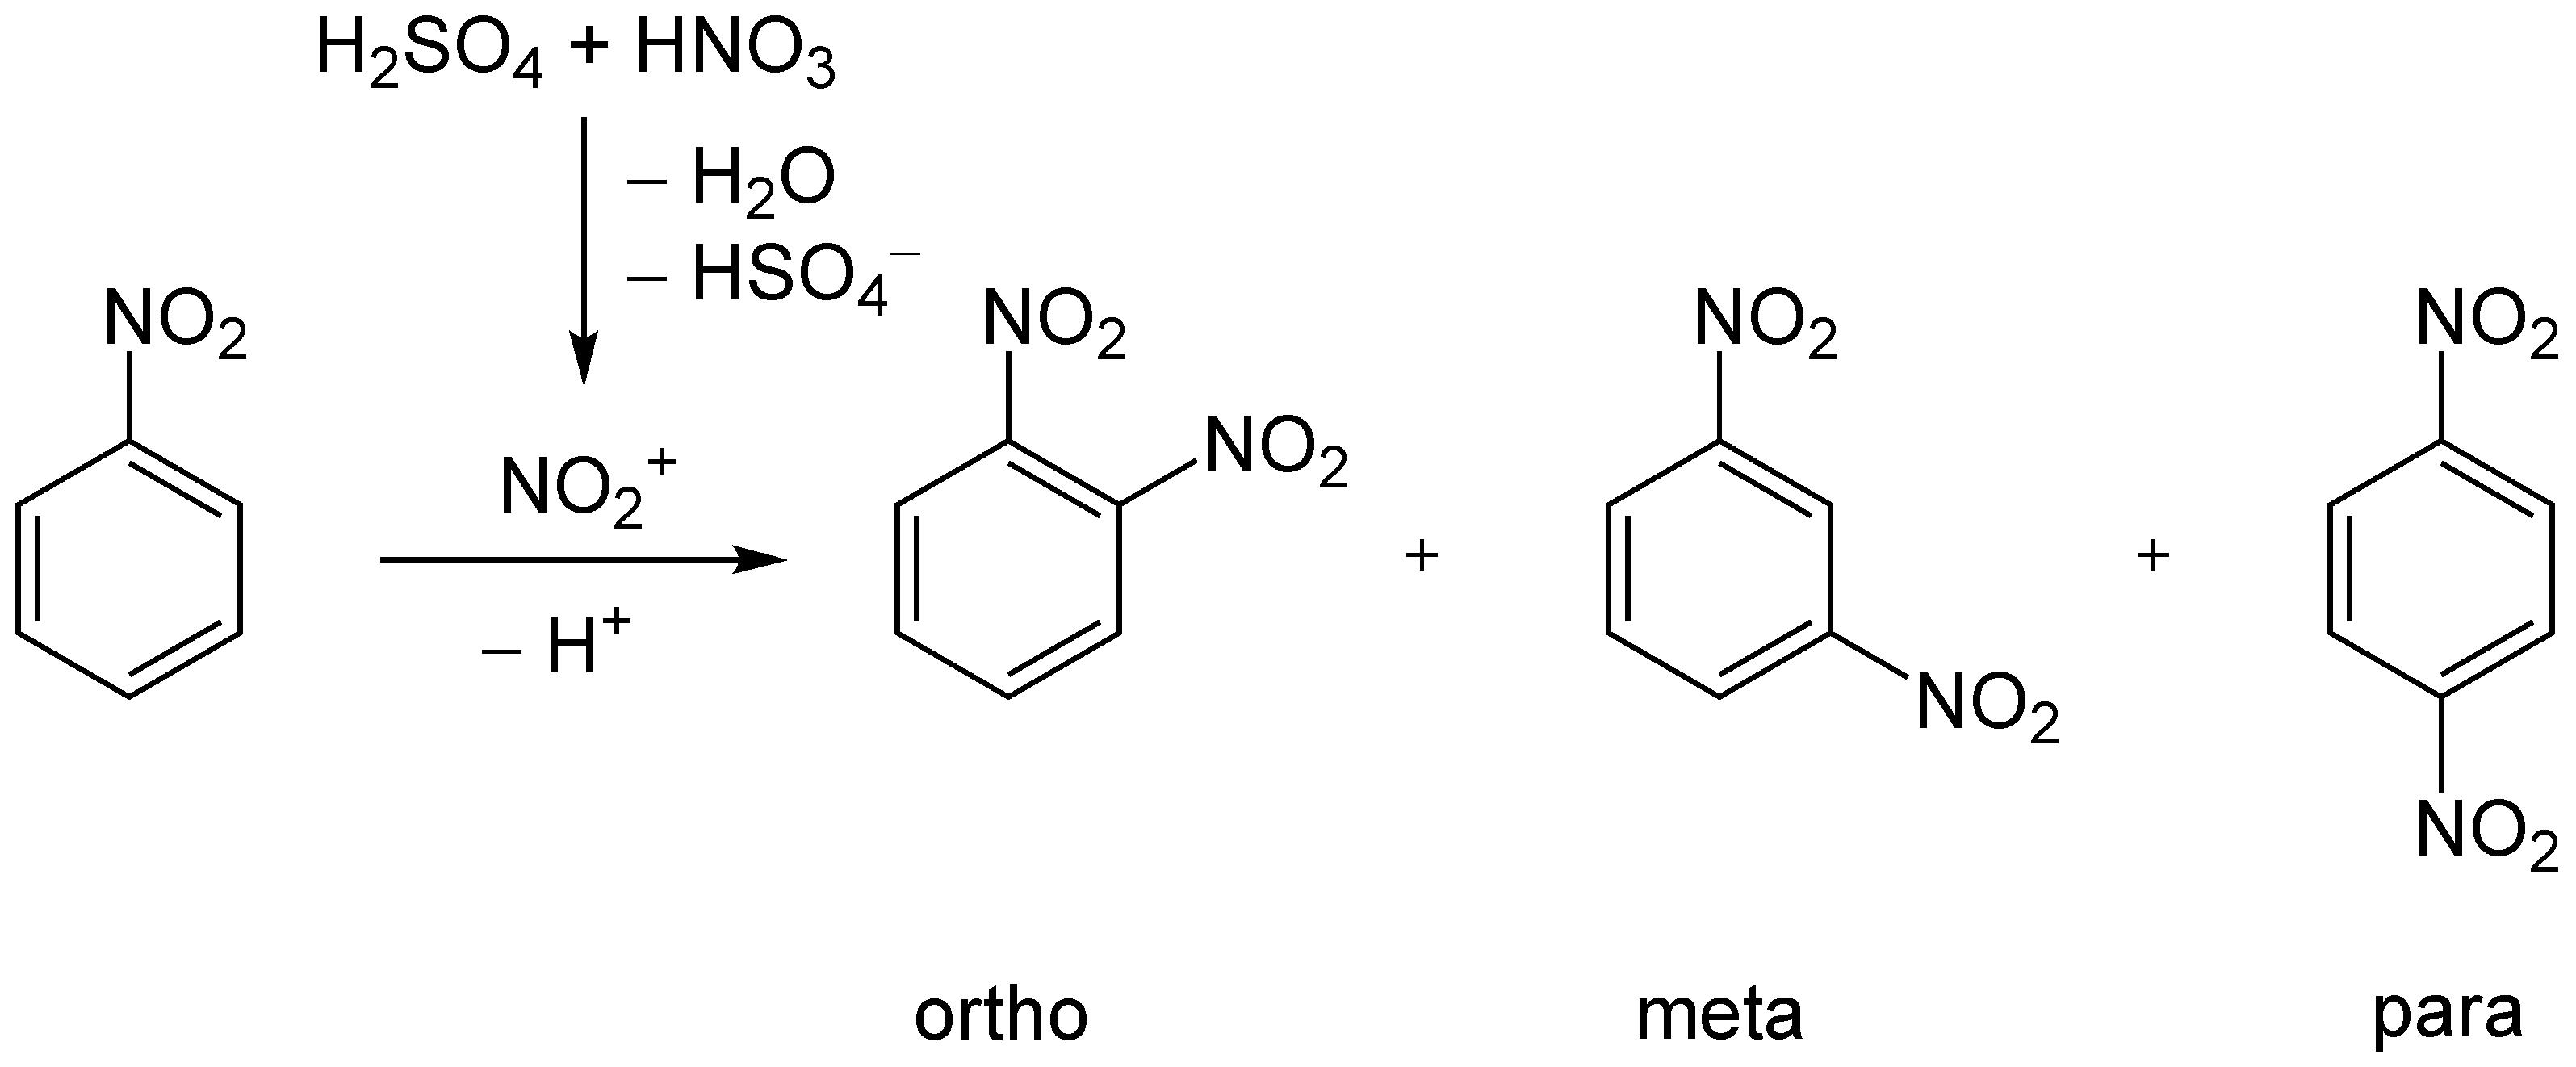 nitration and purification of bromobenzene A multistep reaction process • 5-bromo-benzene-1,3-diol via demethylation  with boron tribromide(bbr3) • 1-bromo-3,5-dimethoxy-2-nitrobenzene via nitration .